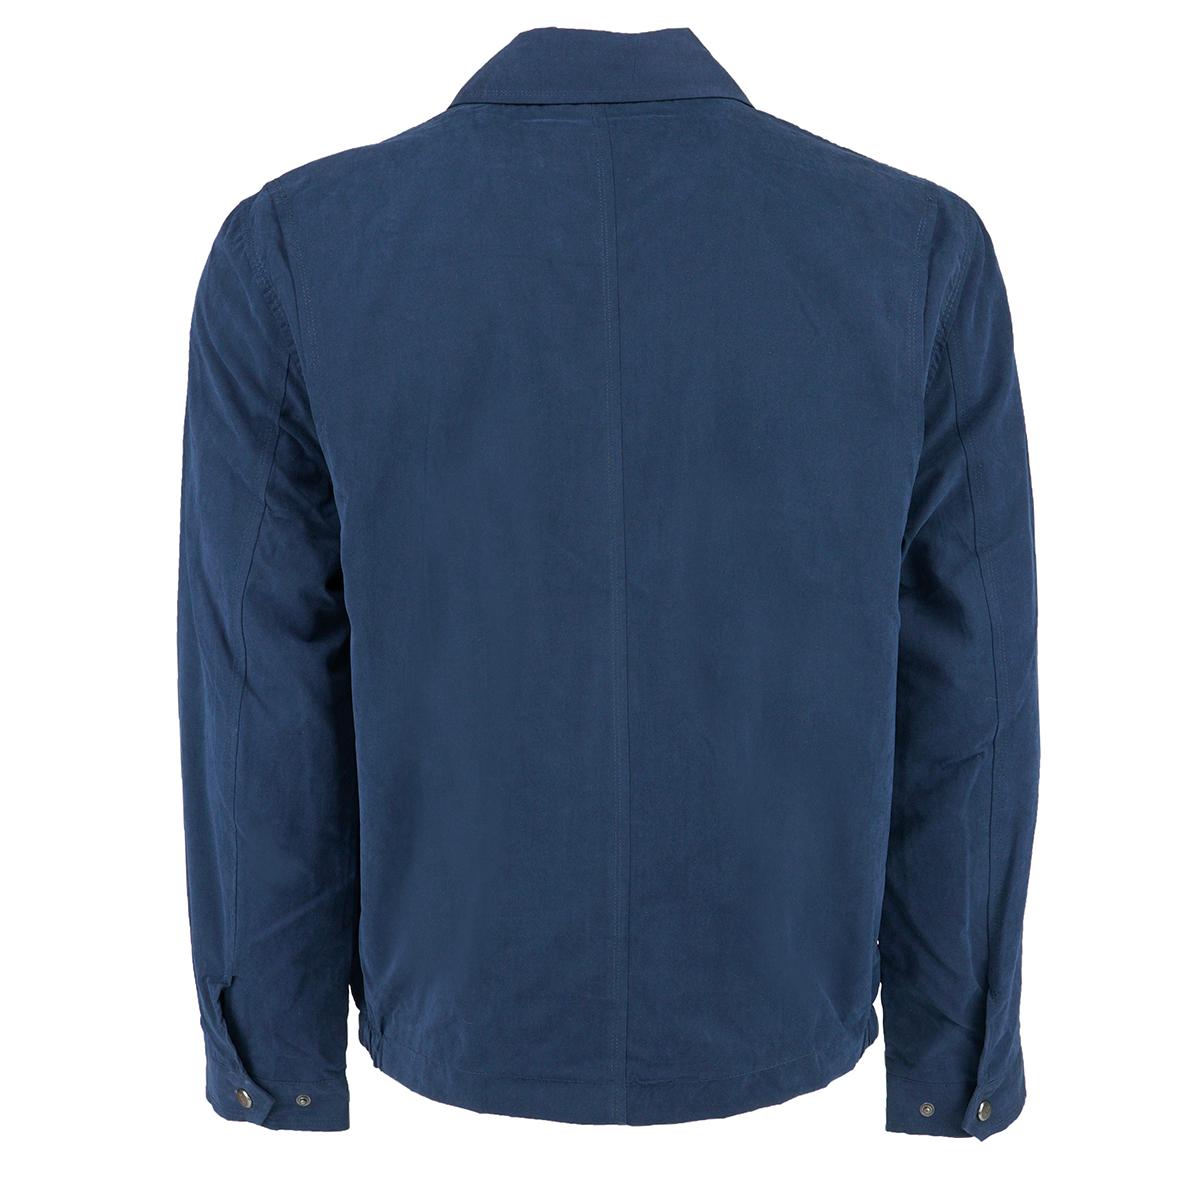 IZOD Mens Microfiber Jacket